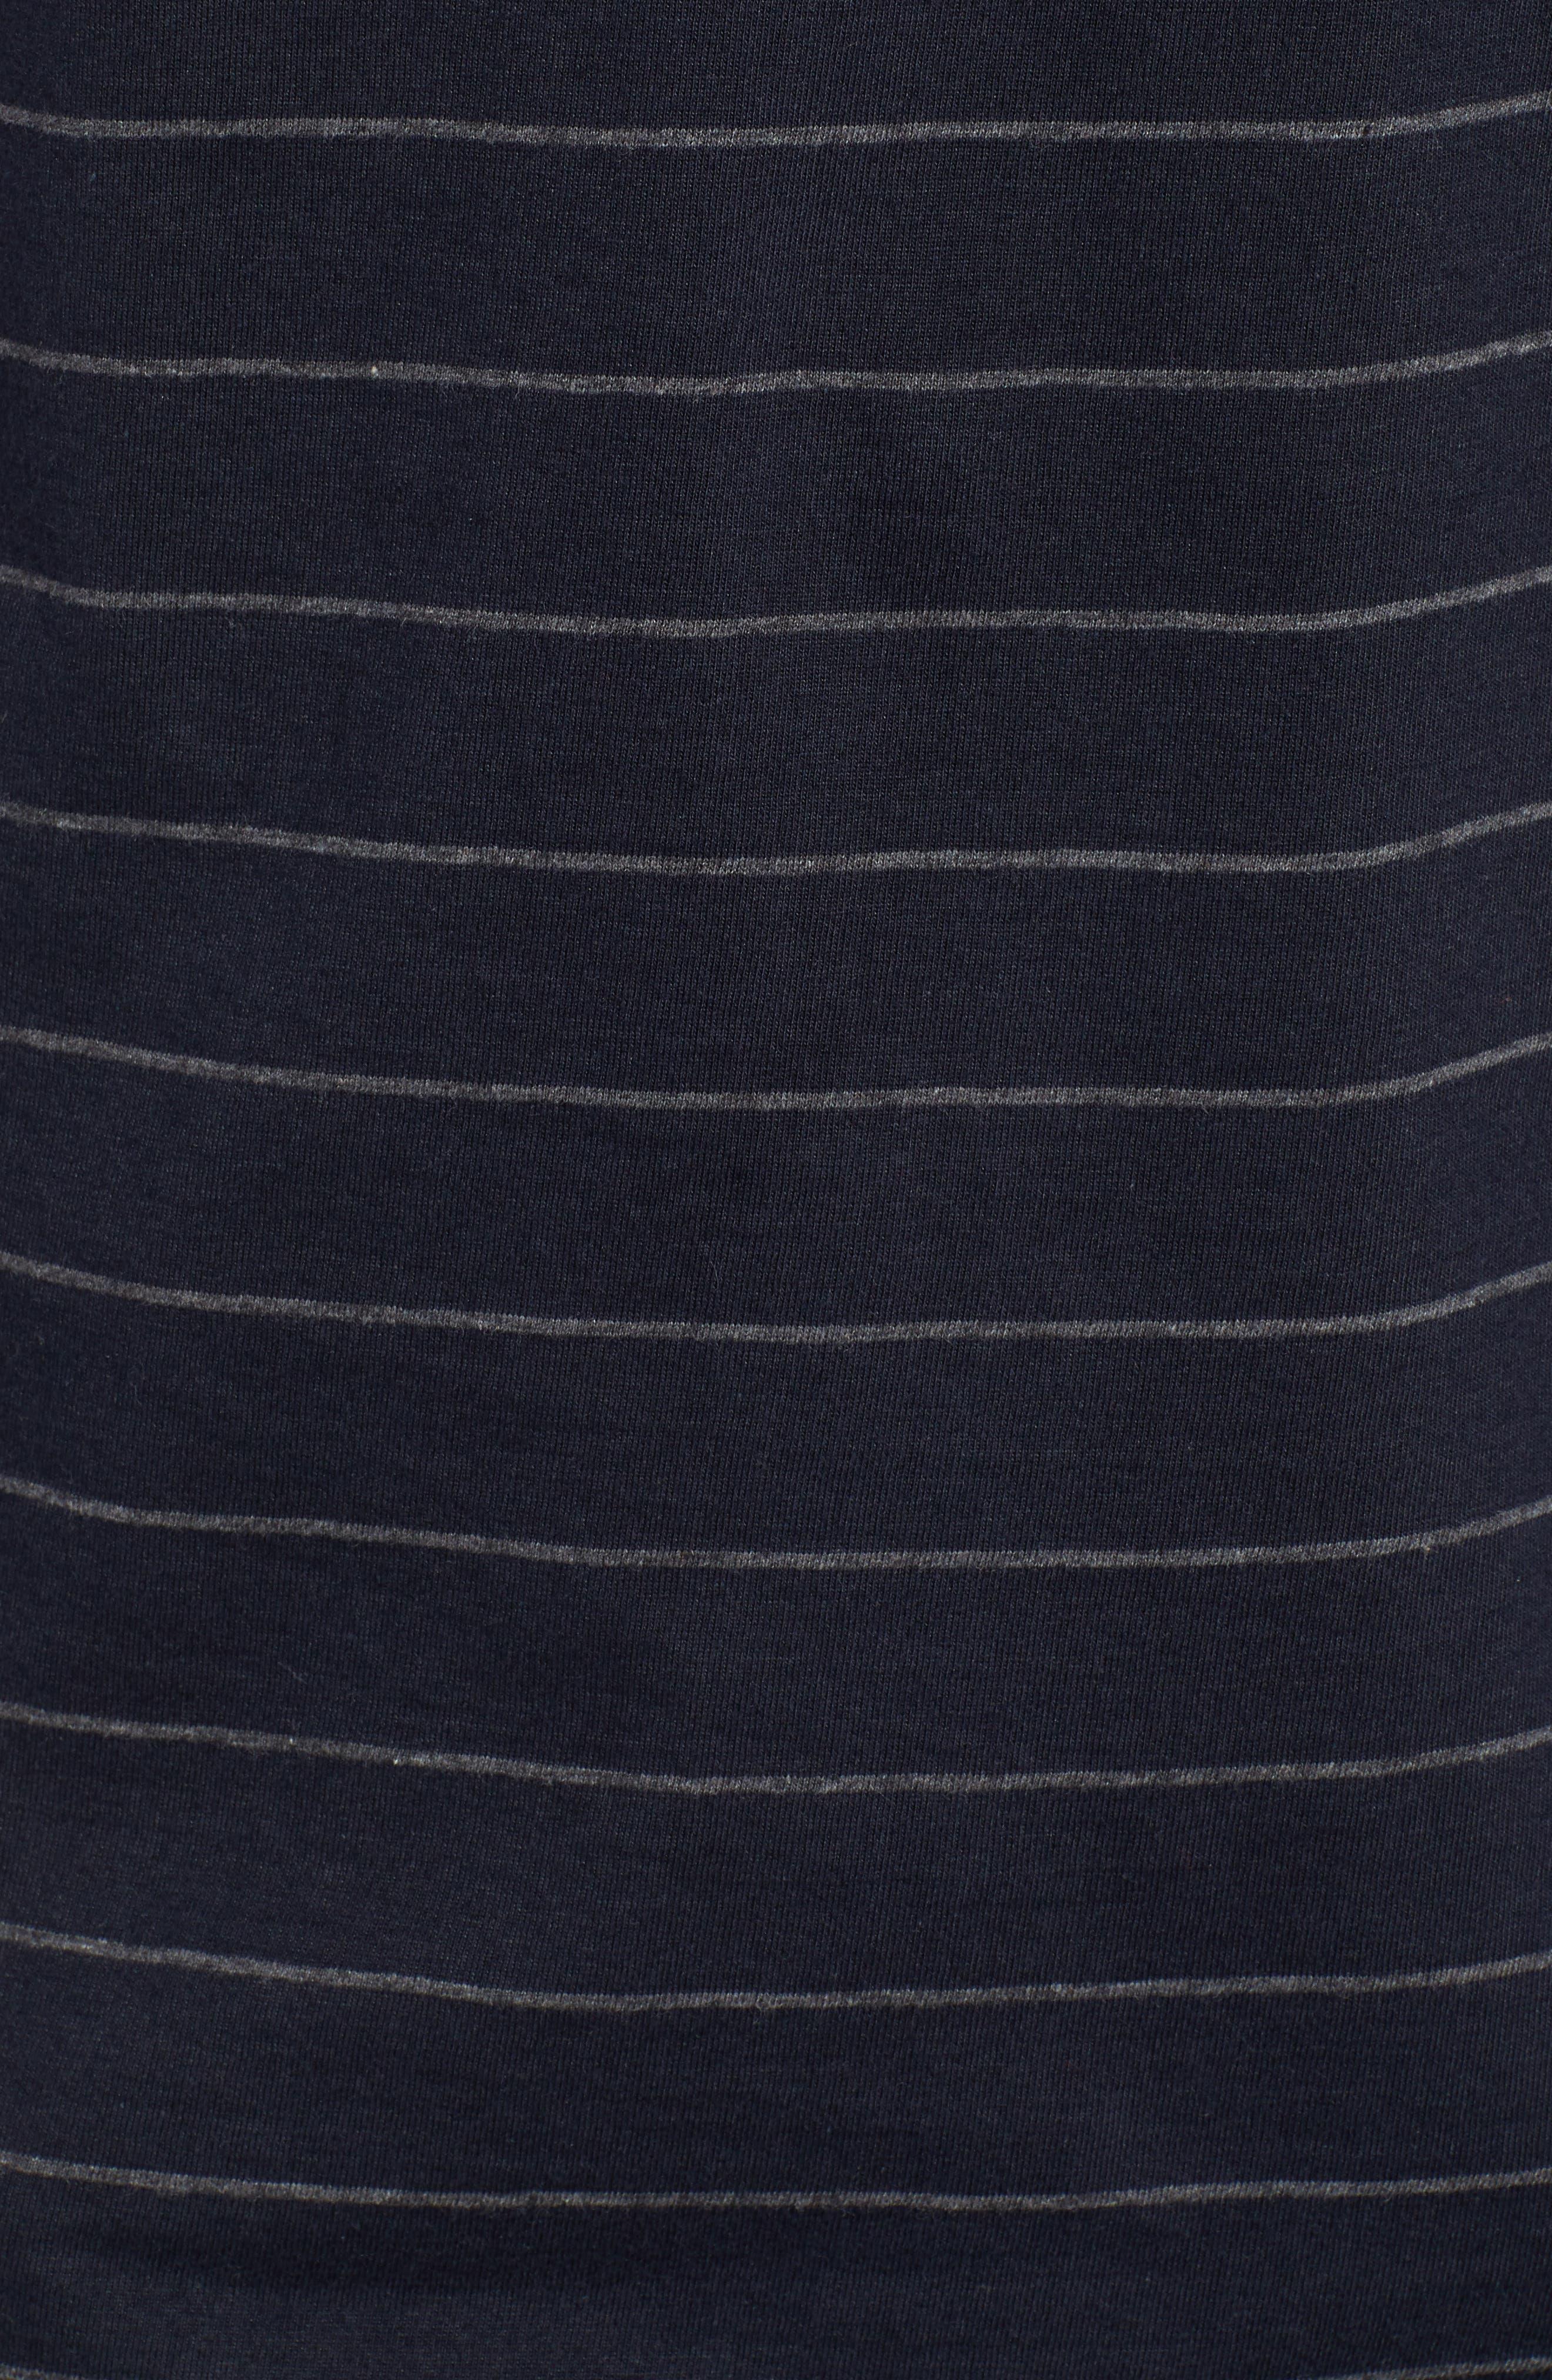 Summer Graded Stripe Pocket T-Shirt,                             Alternate thumbnail 5, color,                             Marine Blue Charcoal Melange